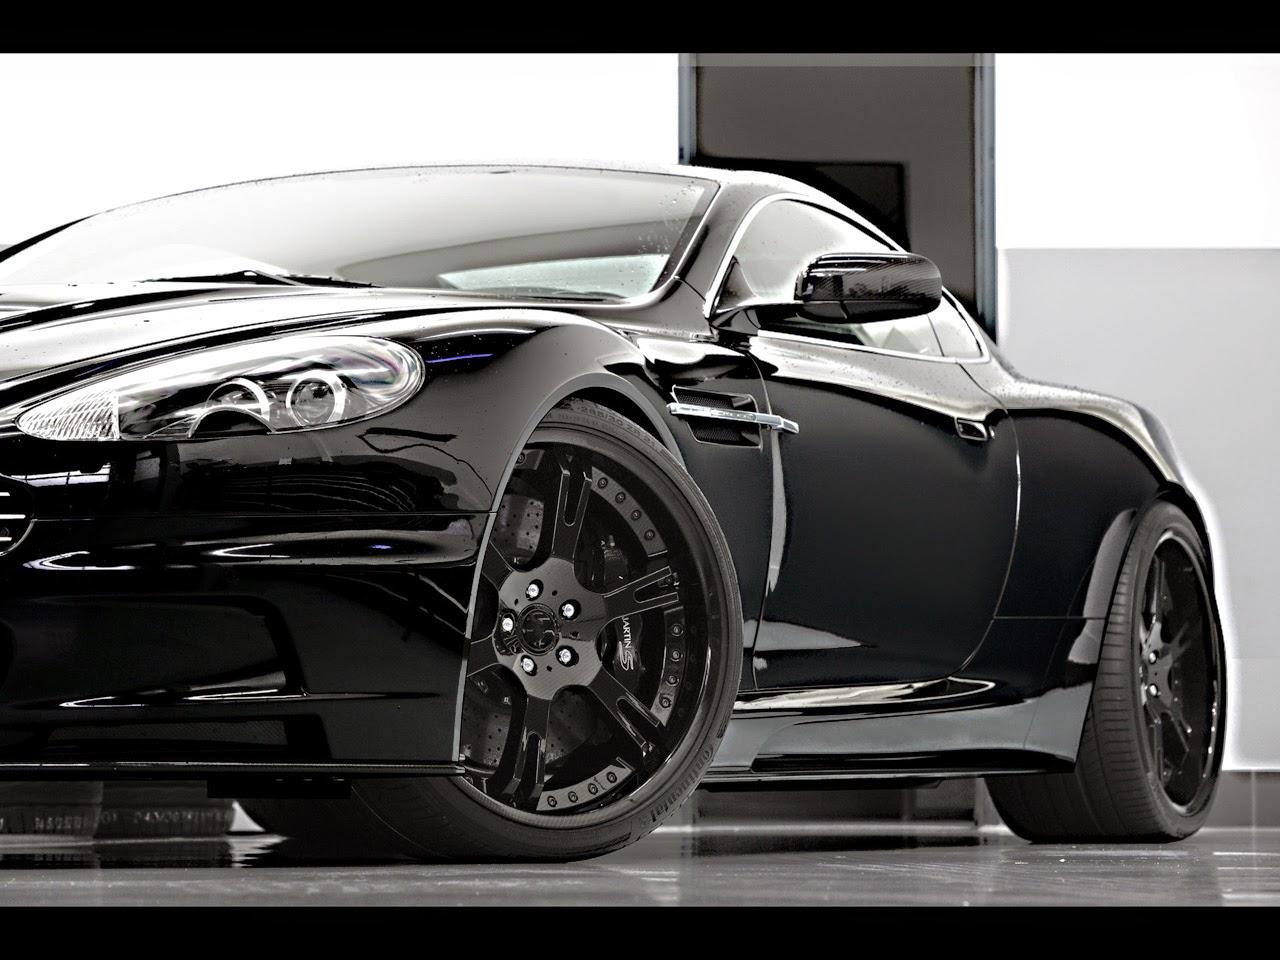 Aston Martin DBS Carbon Edition Car Wallpaper 2012